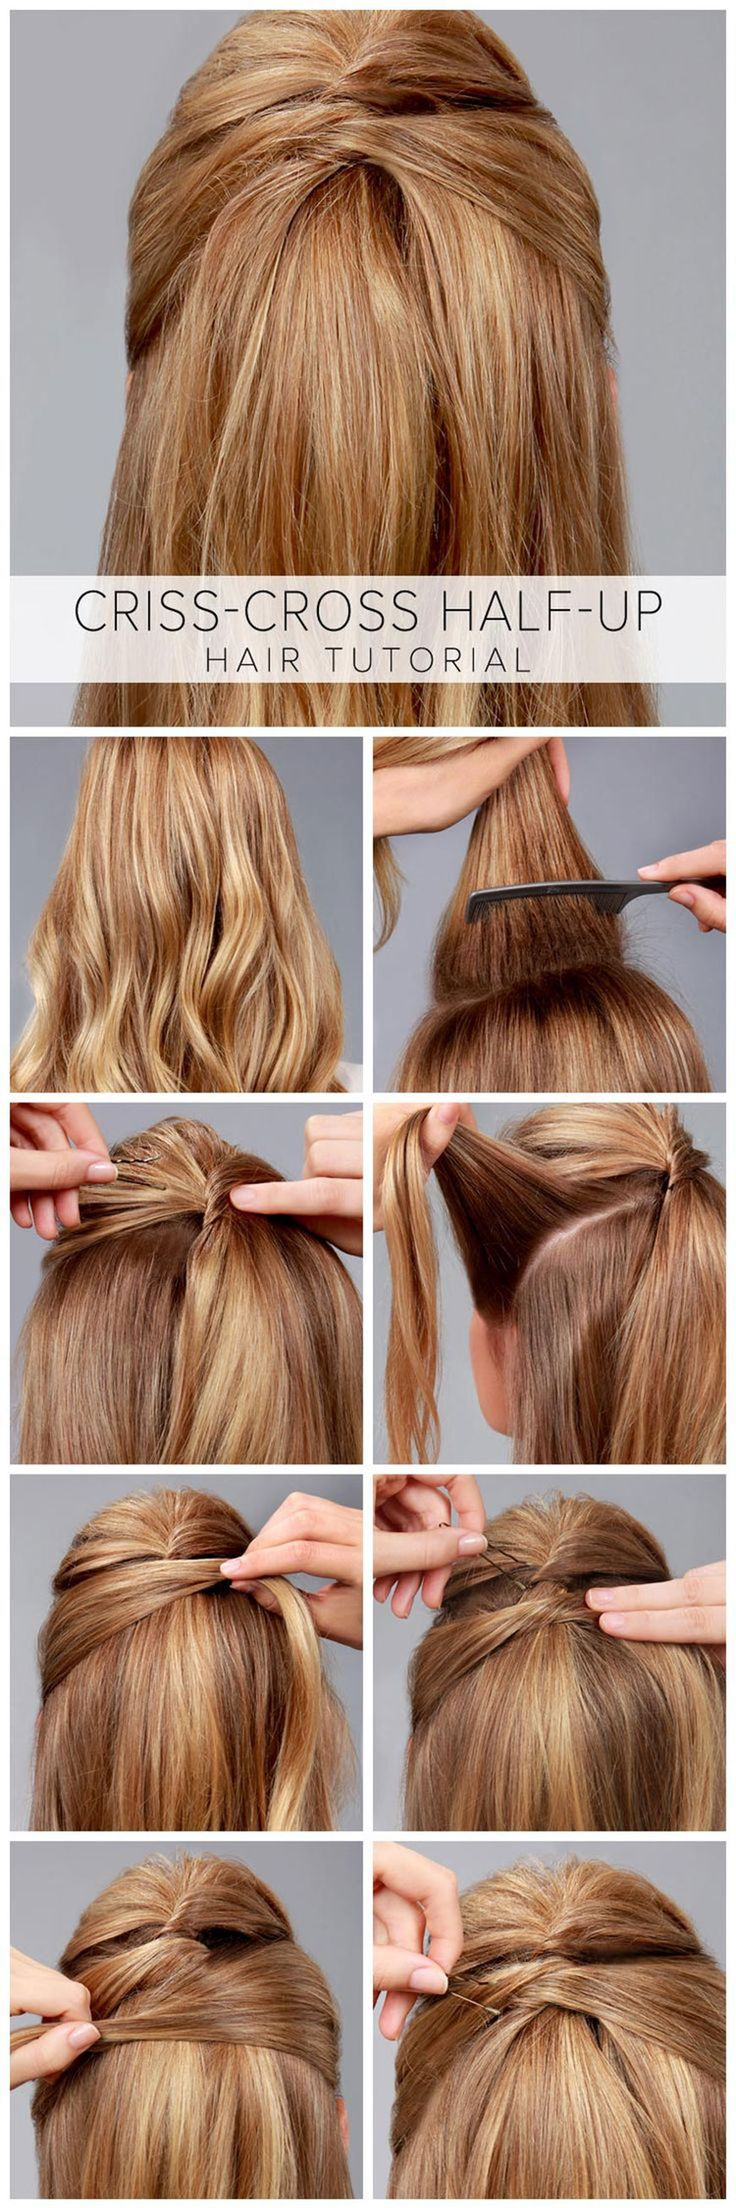 Pin by ⋗ Elda HL⋖ on hair | Hair, Long hair styles, Beauty